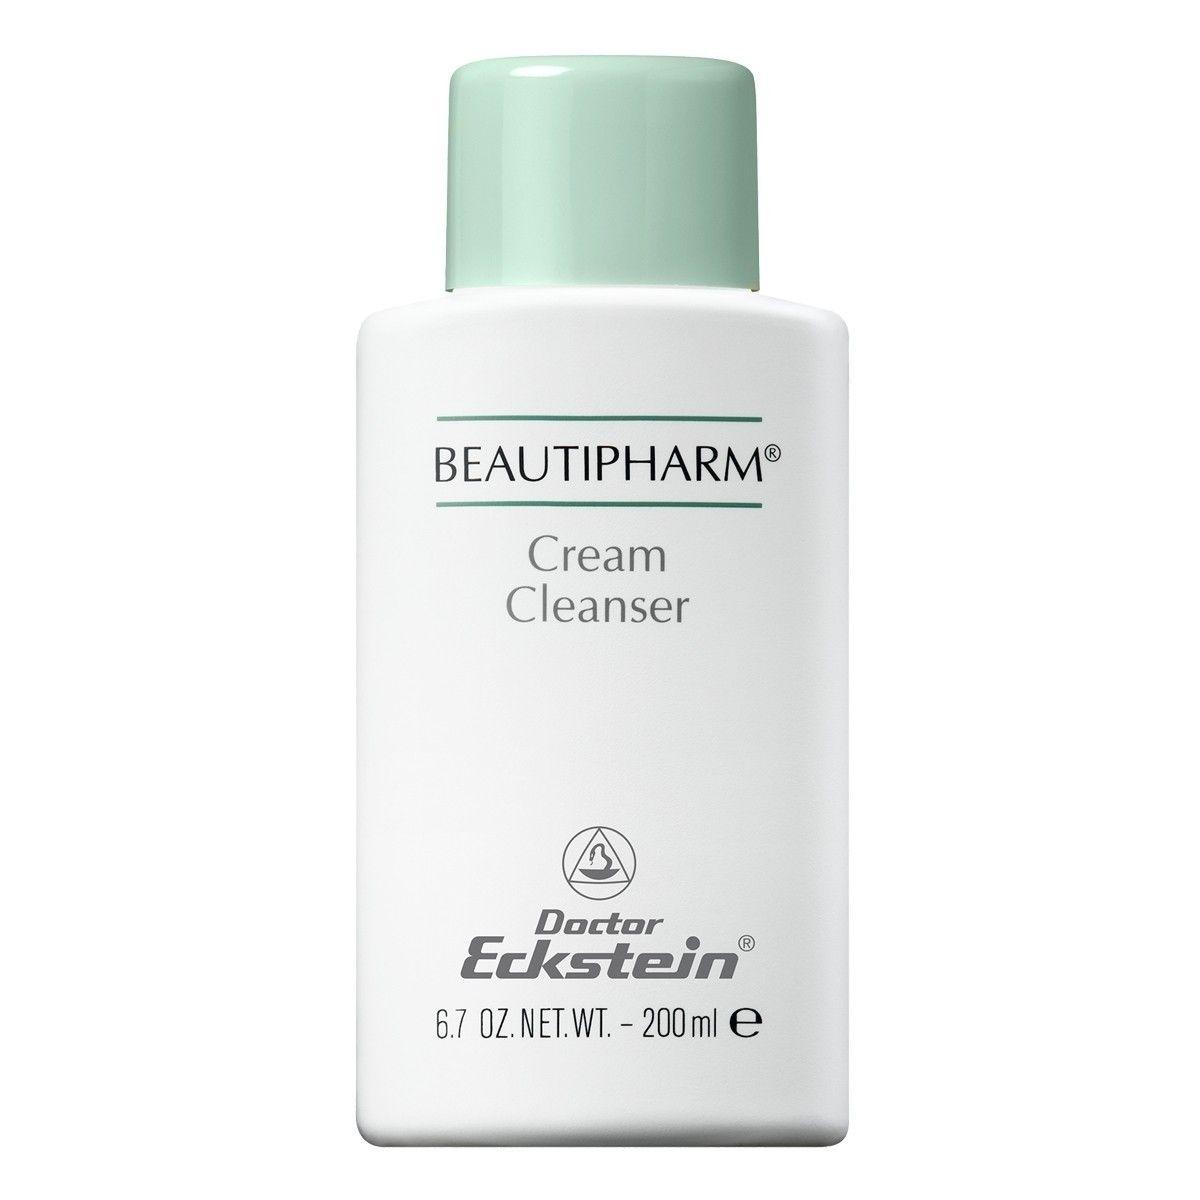 Afbeelding van Doctor Eckstein Beautipharm Cream Cleanser 200ml